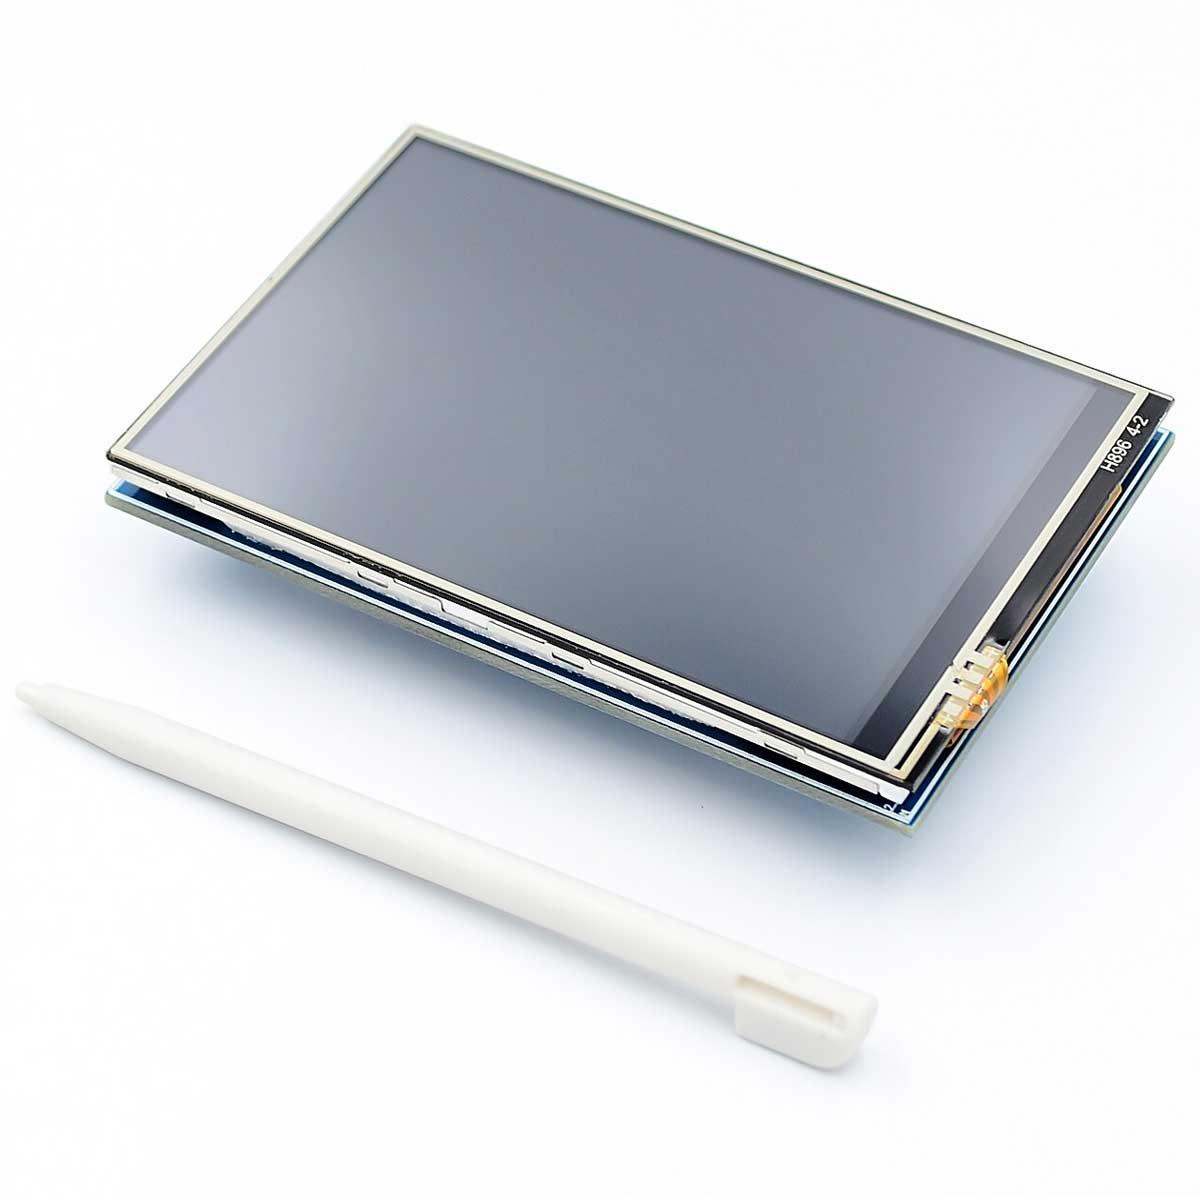 "Display Tela LCD TFT Touchscreen 3.5"" 320 X 480 para Raspberry"